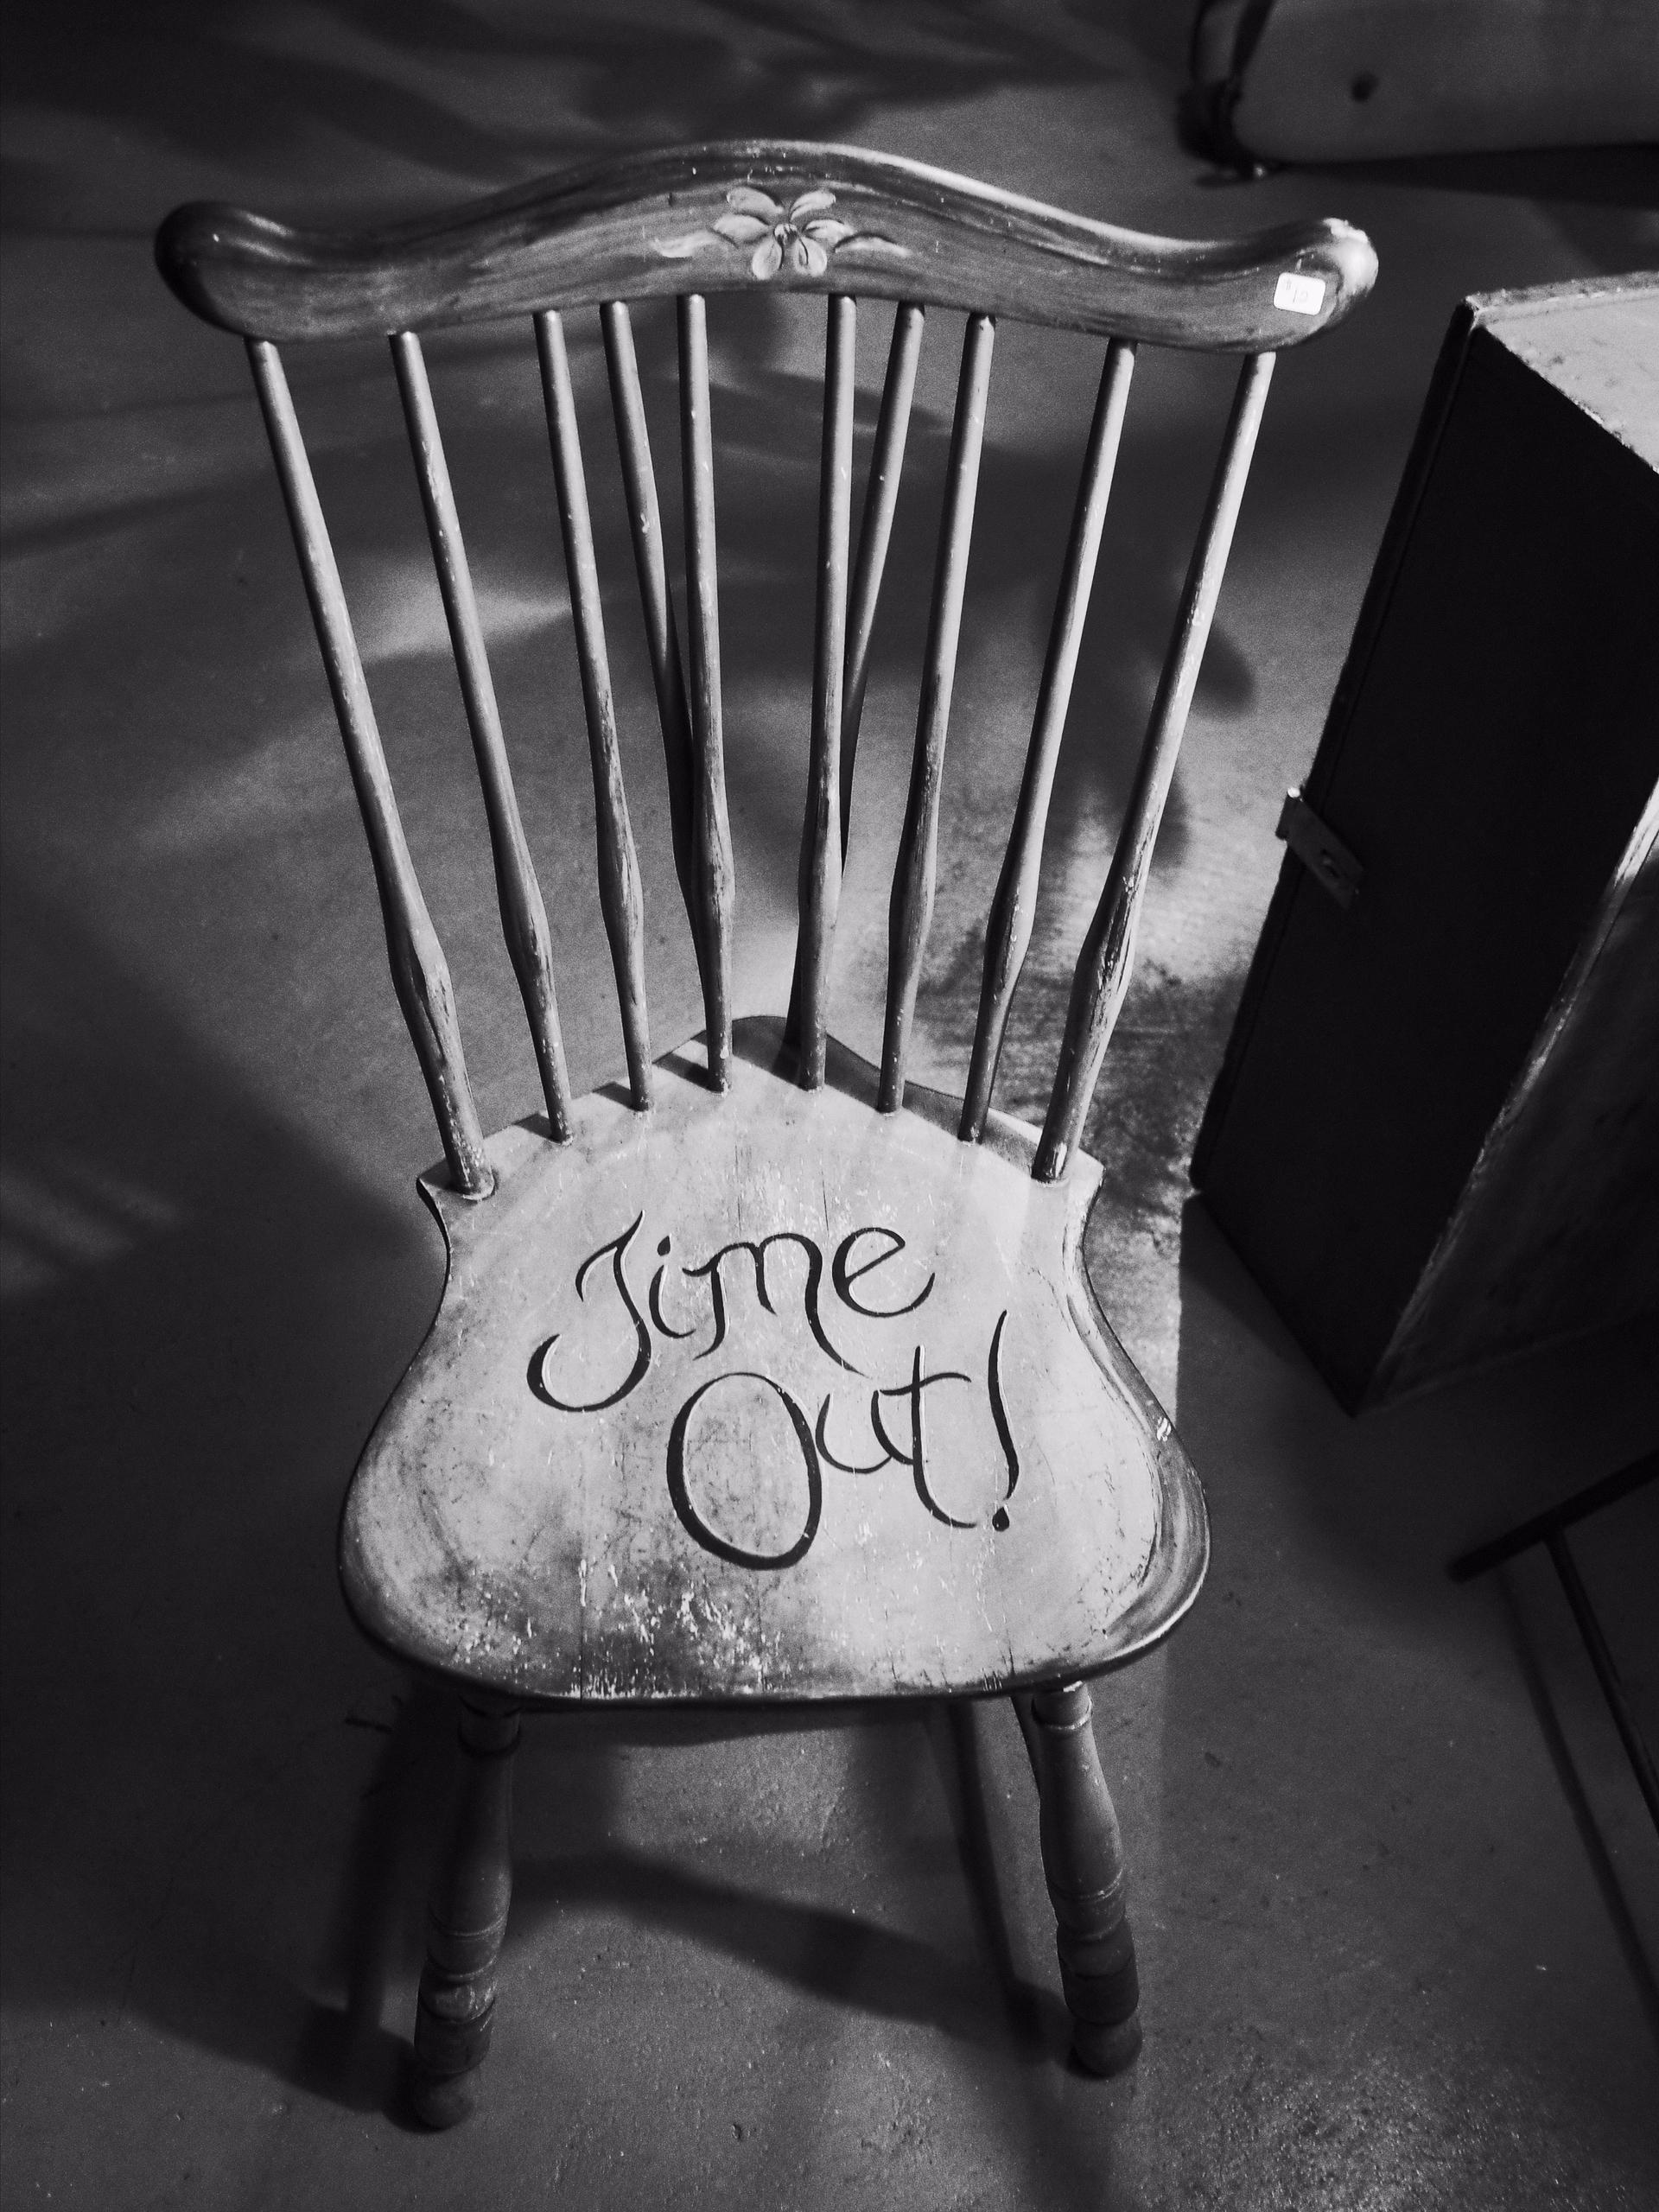 Timeout Chair - michaelraynott | ello